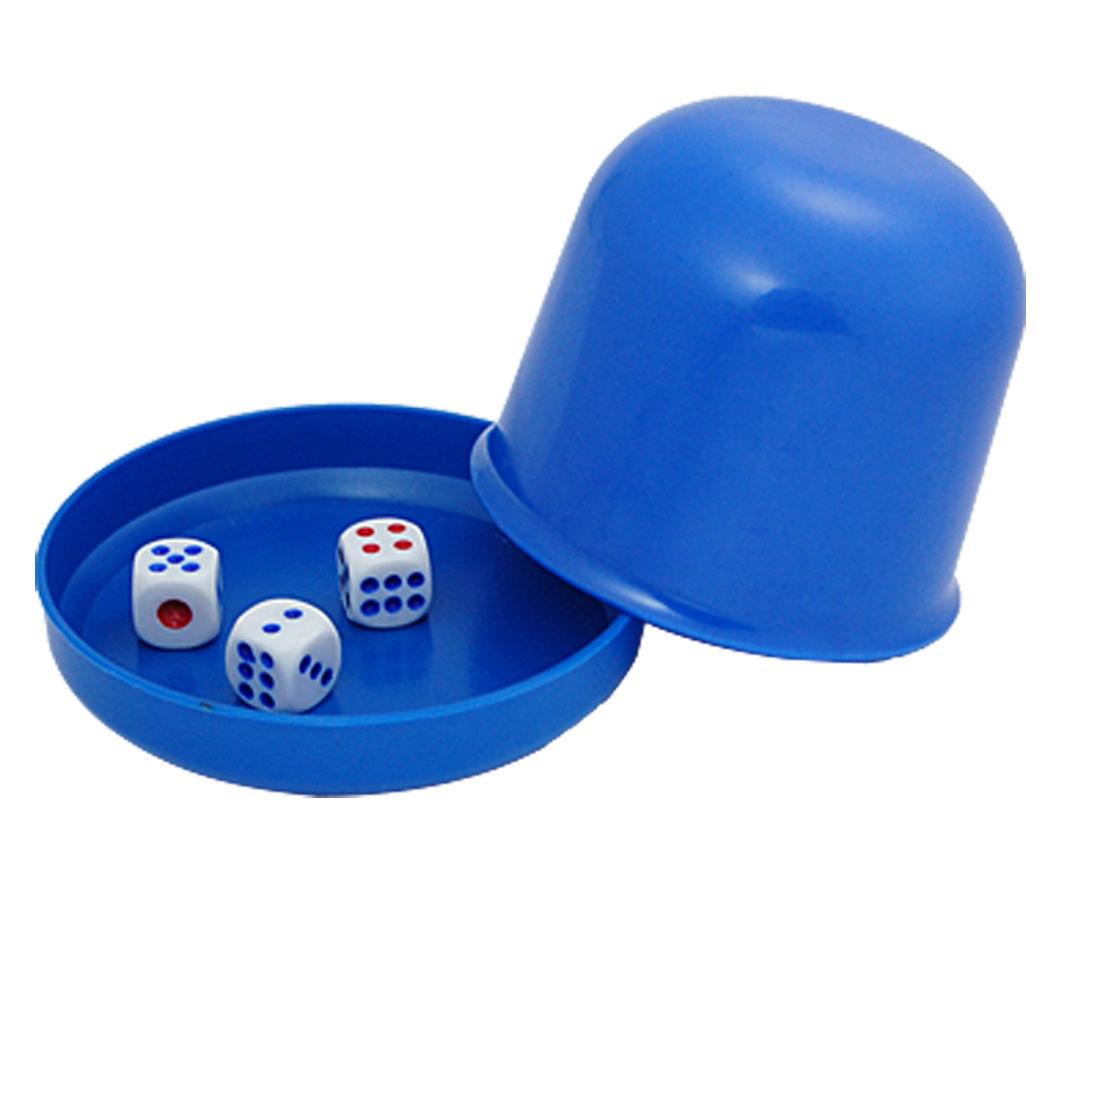 Pub Bar Casino Games Plastic Blue Dice Shaker Cup w 3 Dices